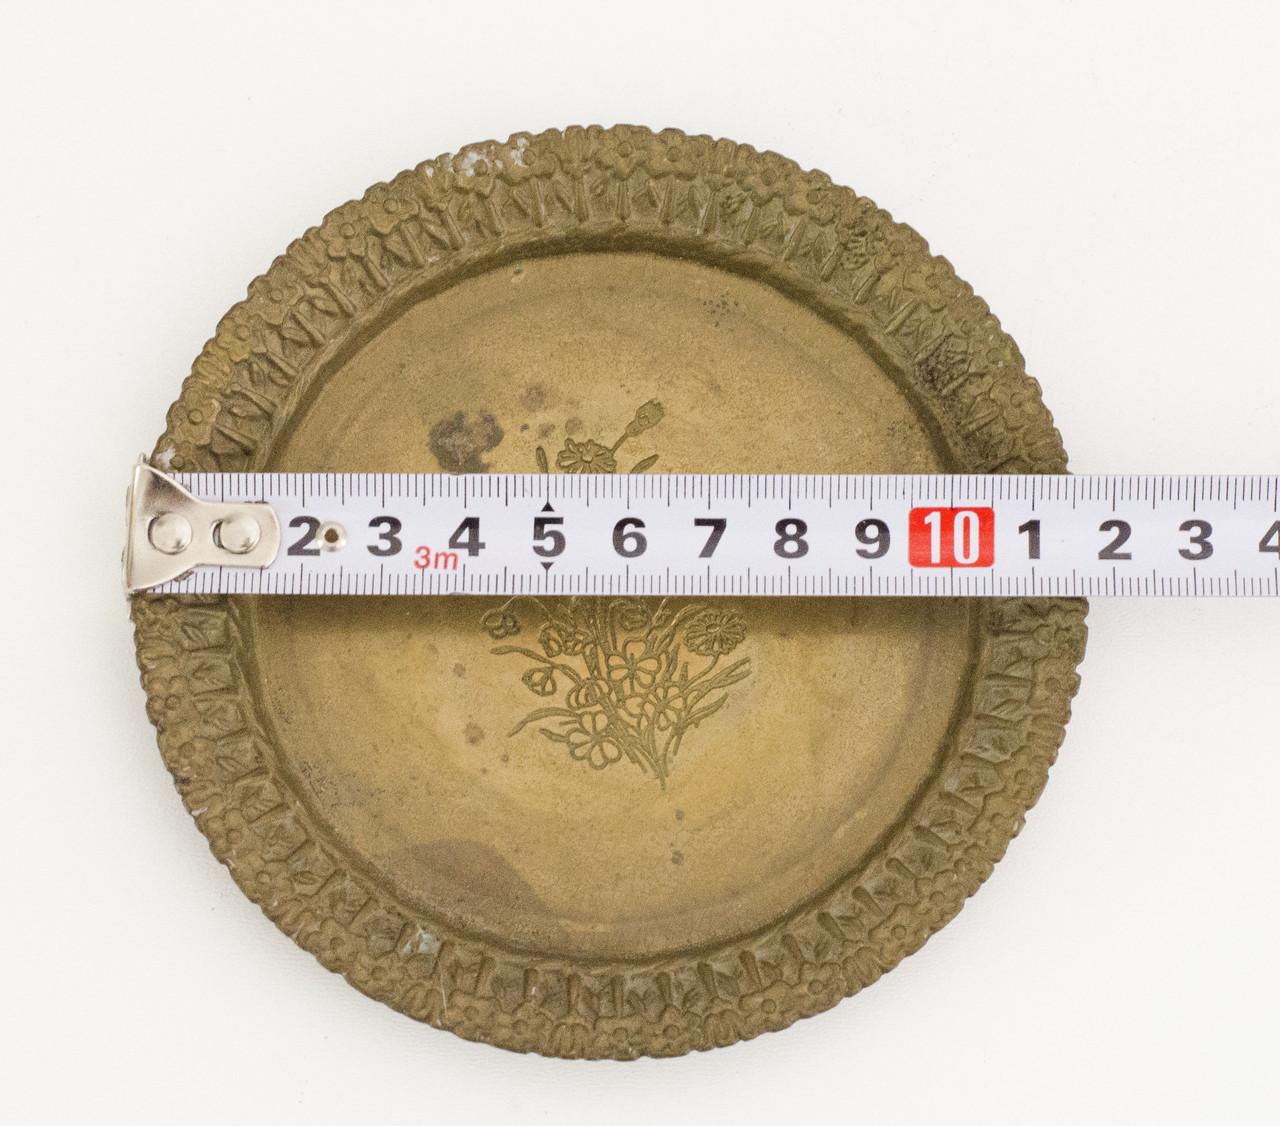 Коллекционная бронзовая тарелка, бронза, Германия, SKS